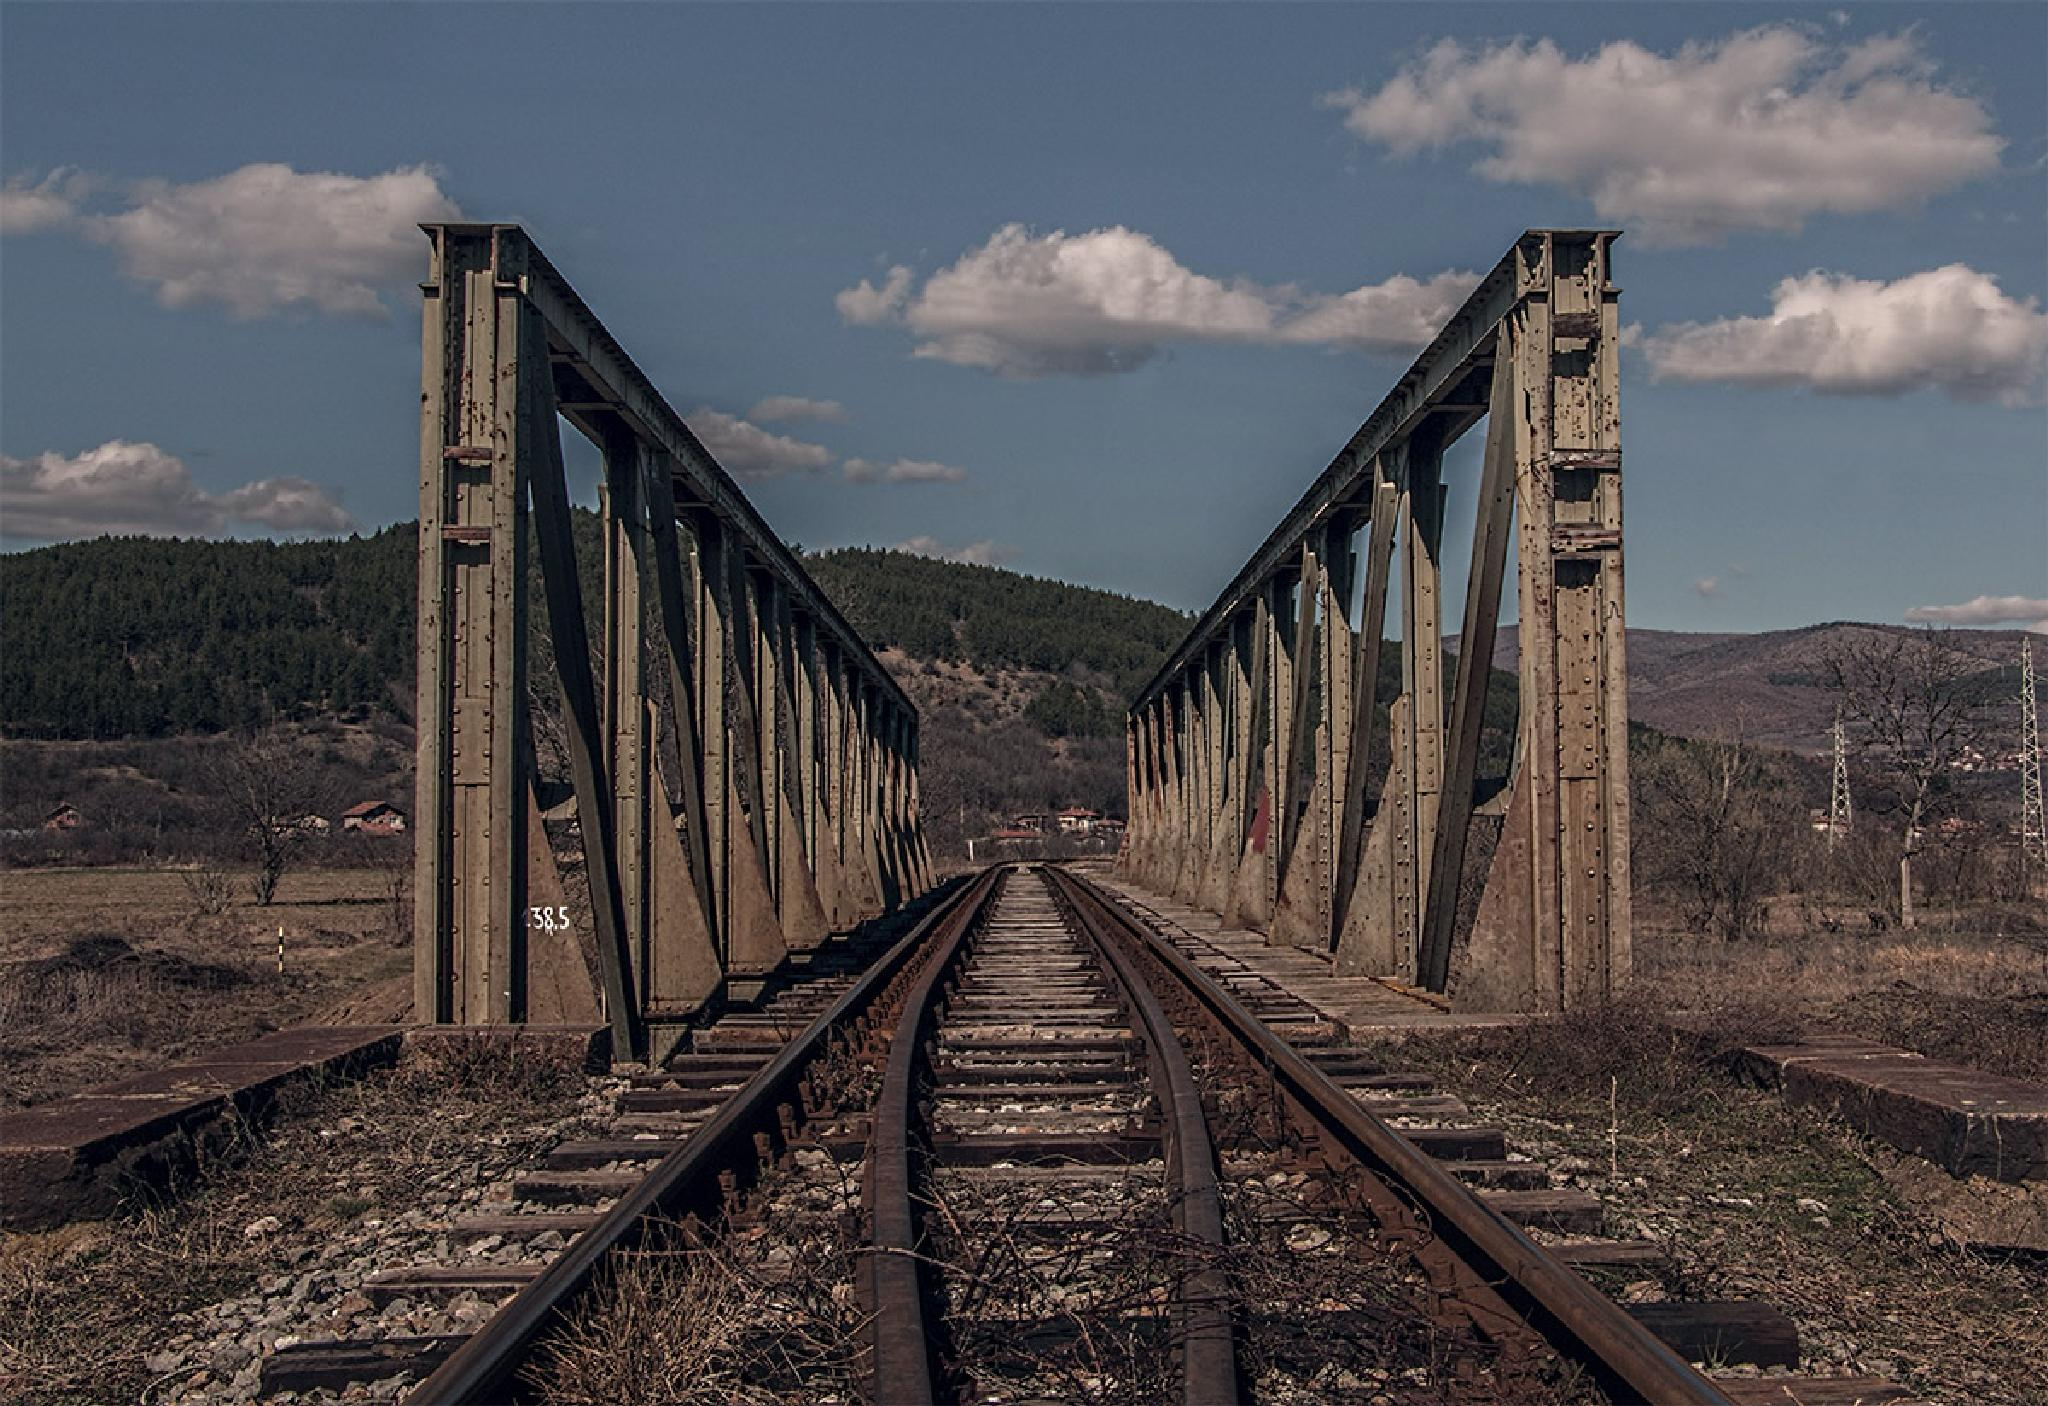 Railway in Bulgaria by Avgvstvs